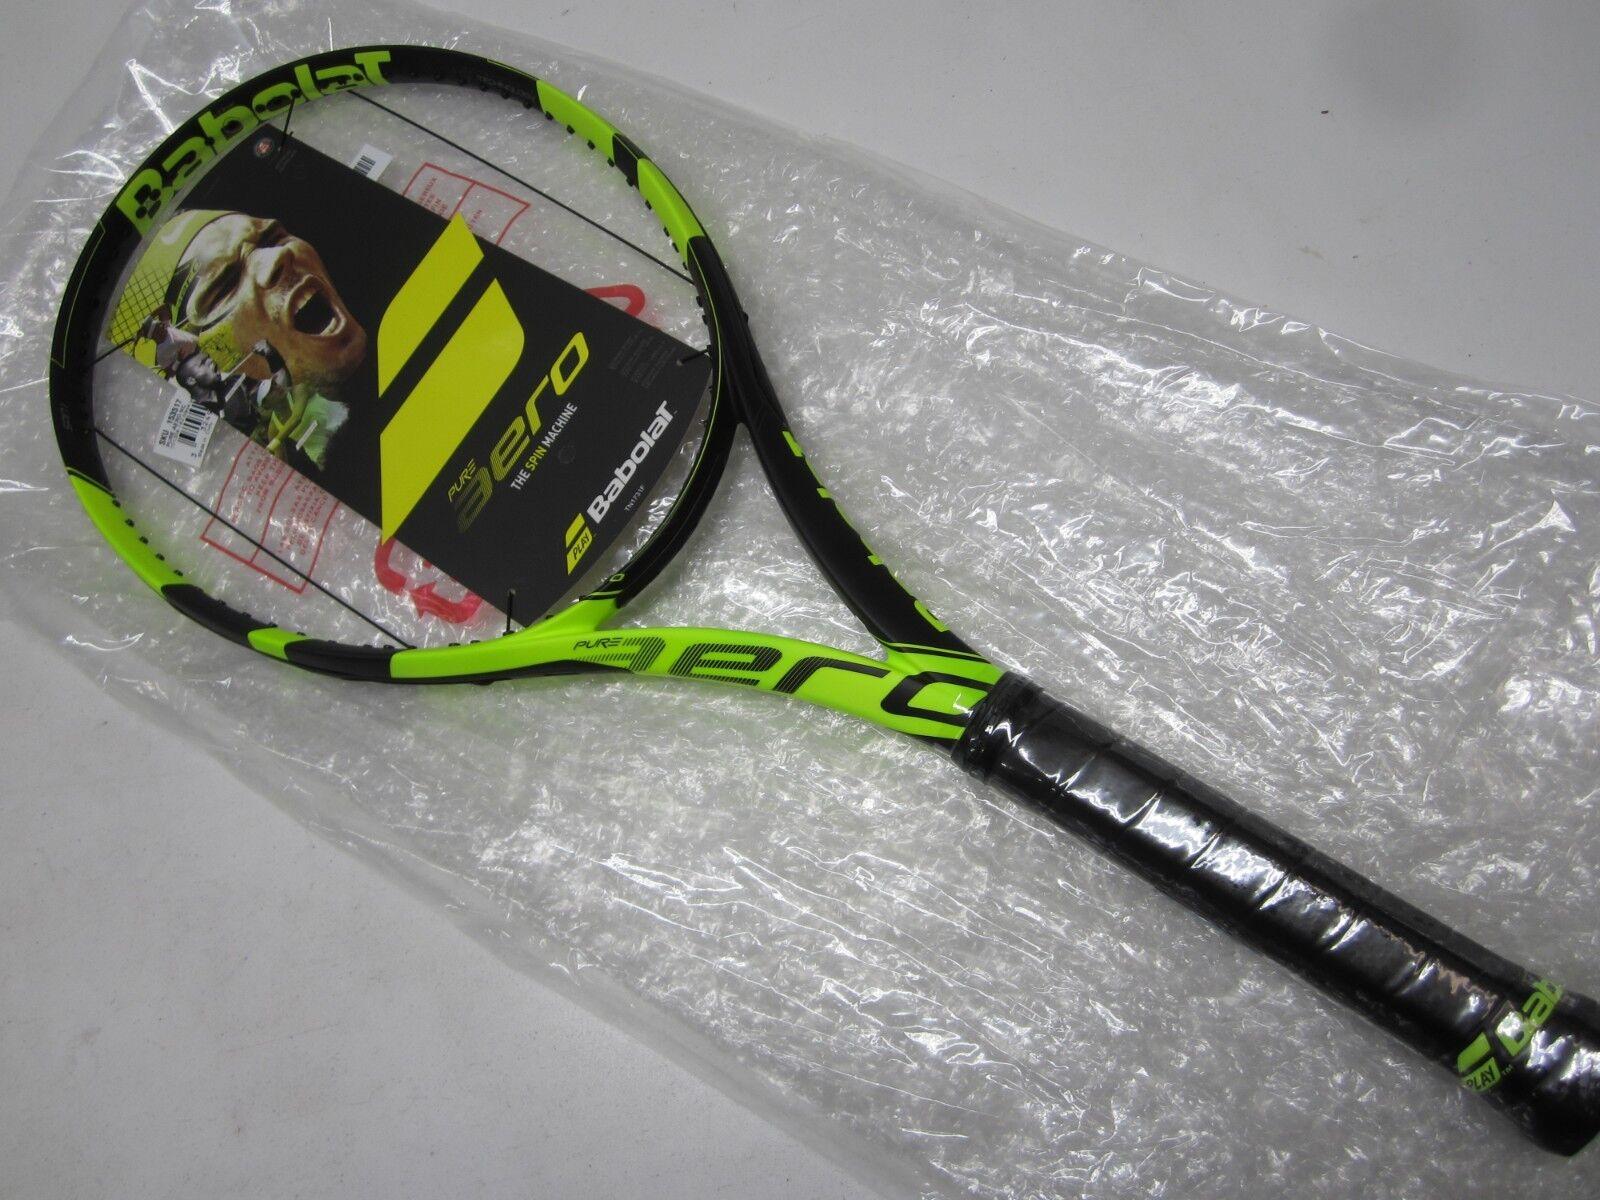 NOUVEAU  2018 BABOLAT PURE AERO Raquette de Tennis (4 3 8)